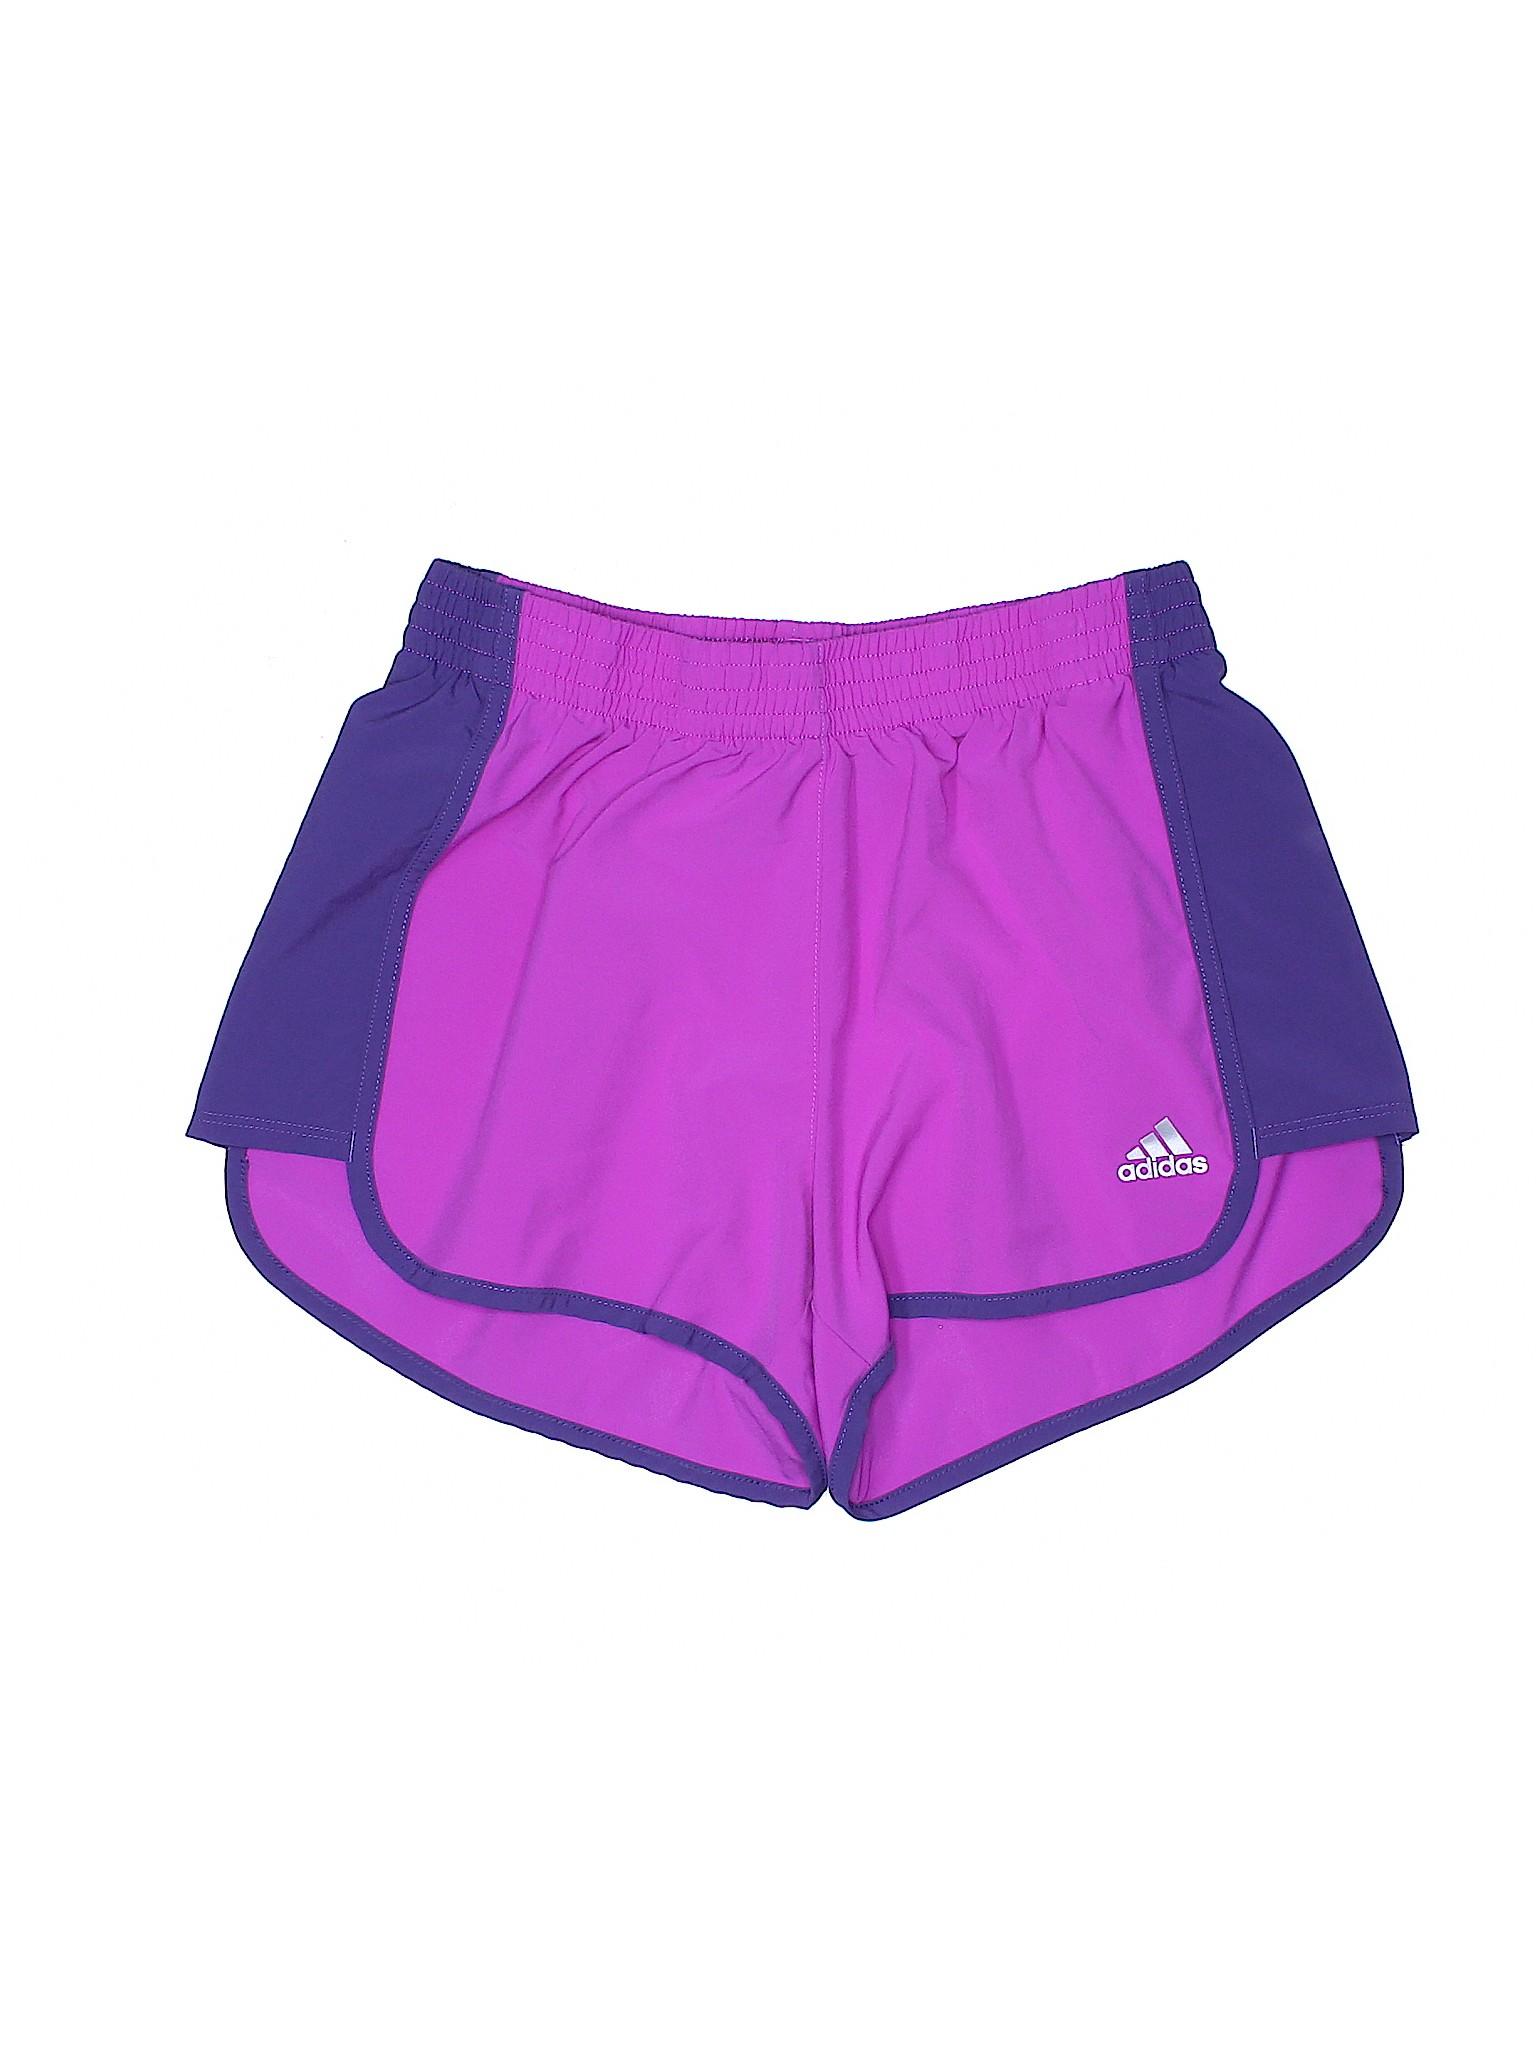 leisure Athletic leisure leisure Adidas Boutique Adidas Boutique Shorts Shorts leisure Boutique Athletic Boutique Shorts Athletic Adidas qEwHxaA